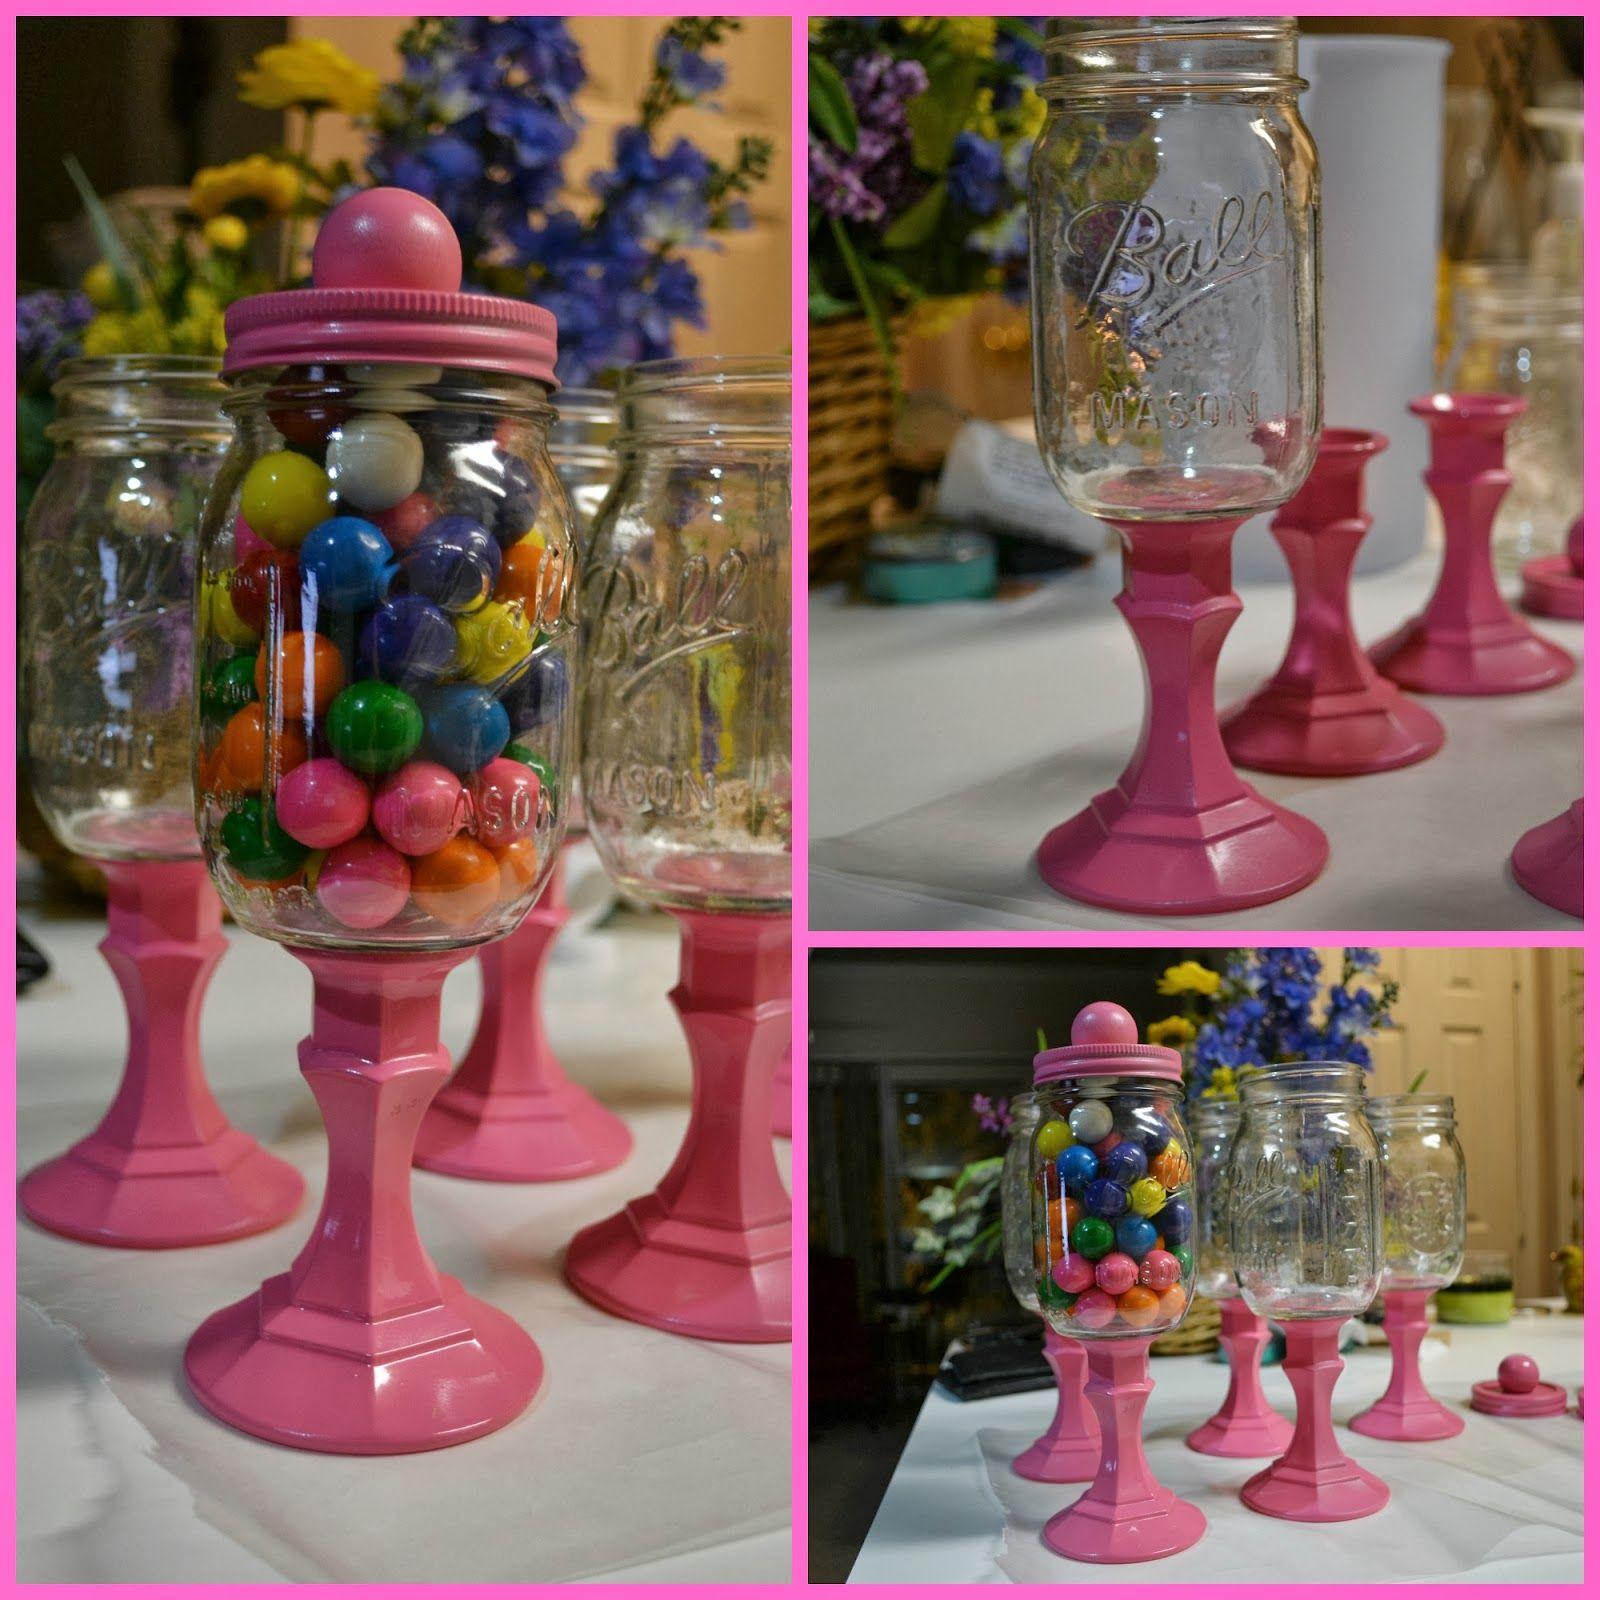 Mason candy jars diy crafty ideas pinterest jar